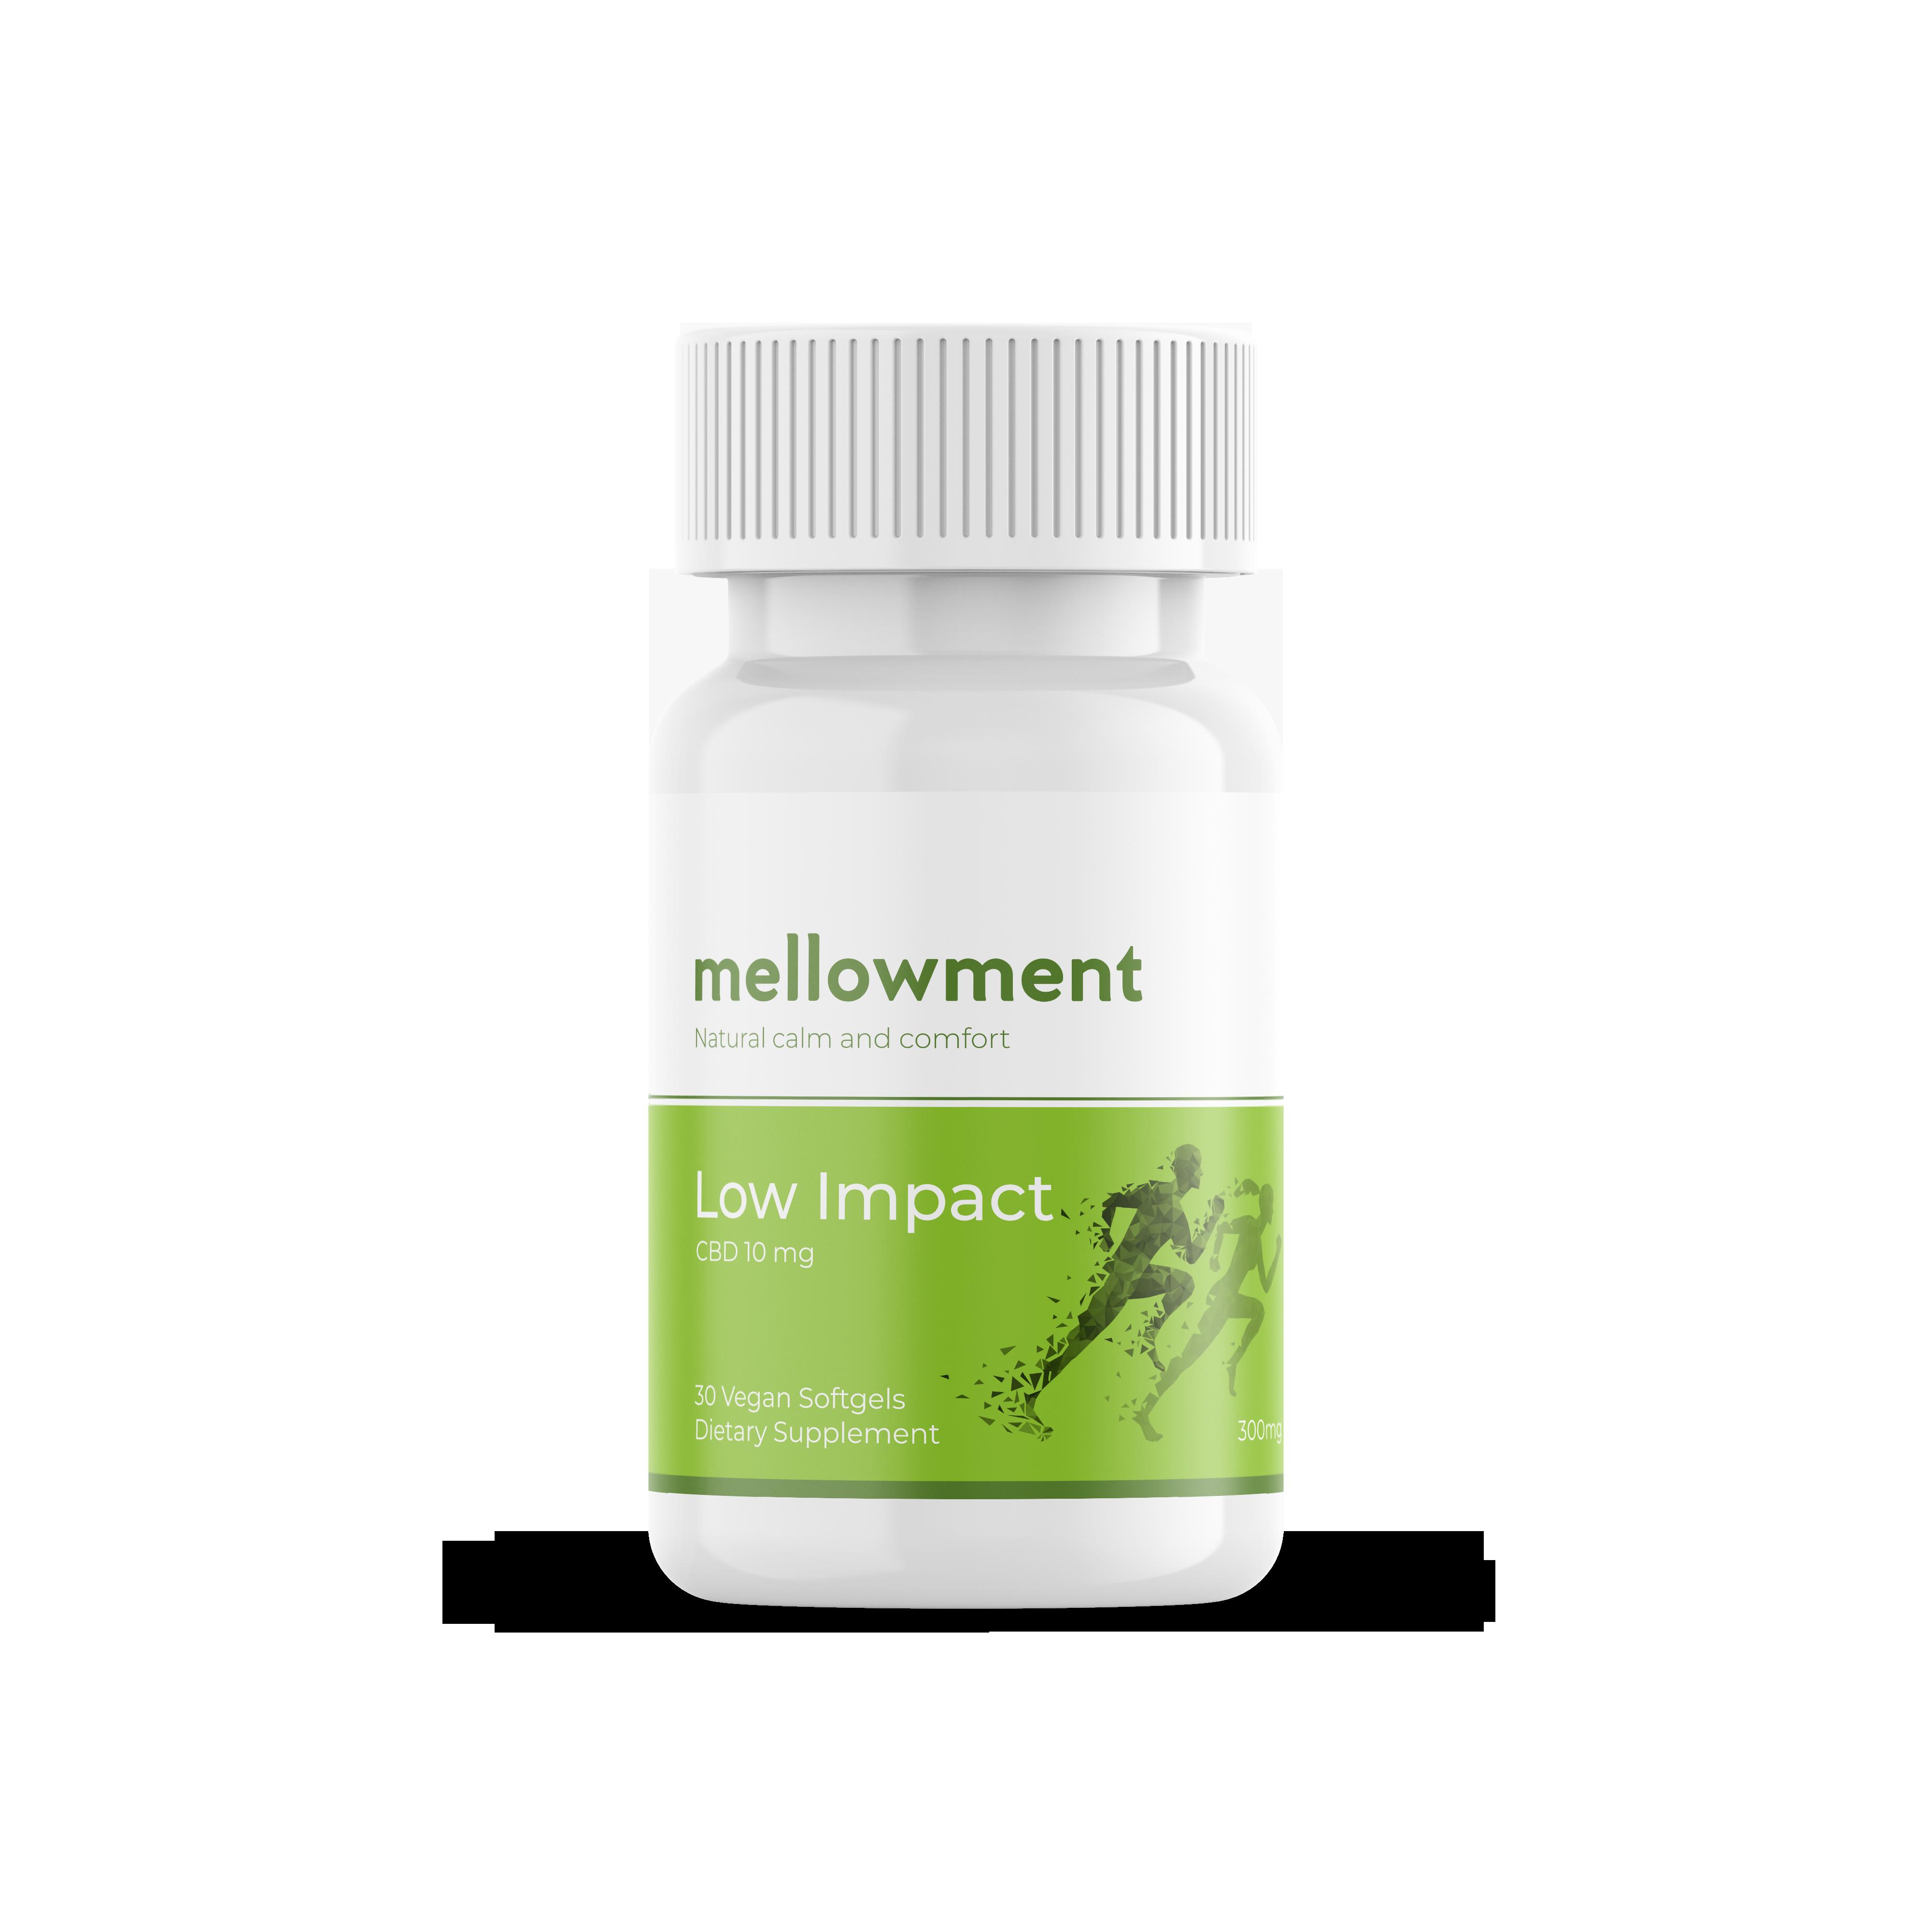 Mellowment Bottle Label